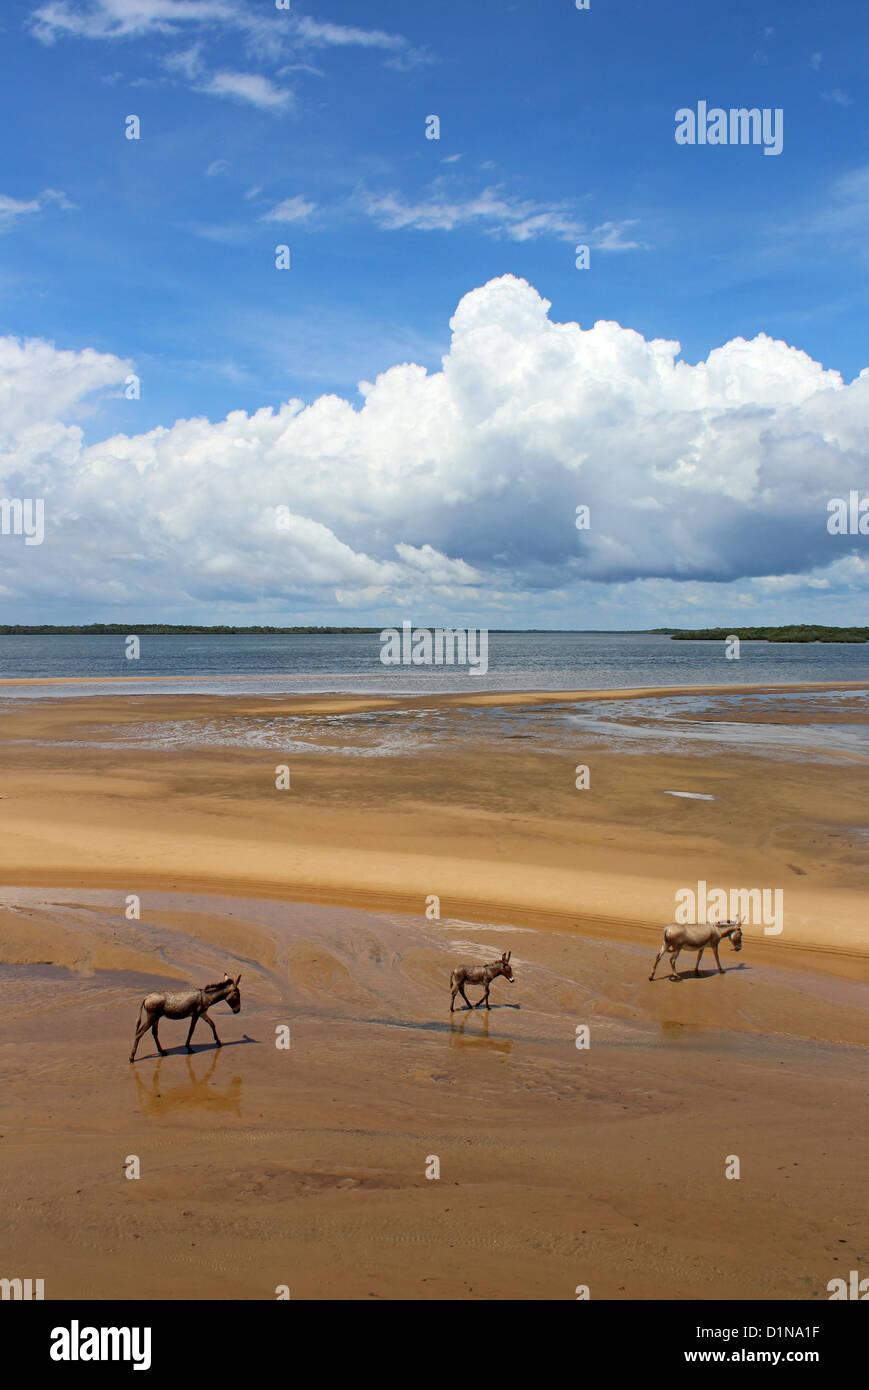 Donkey family on the beach, Lamu Island, Kenya, East Africa Stock Photo